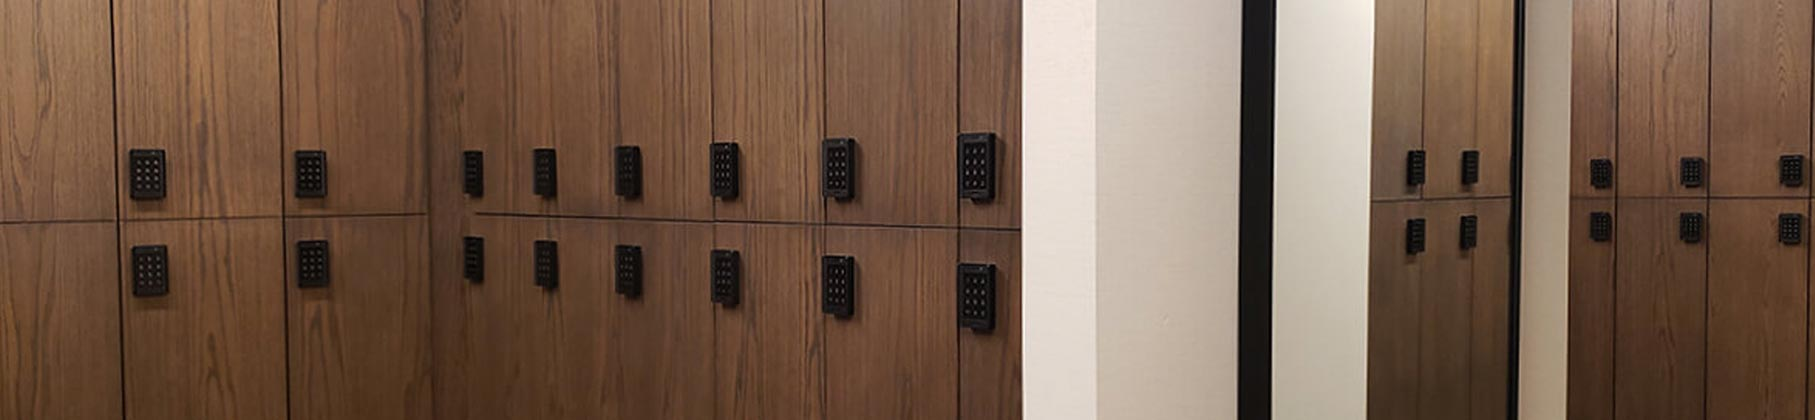 Zogics Club Wood Lockers